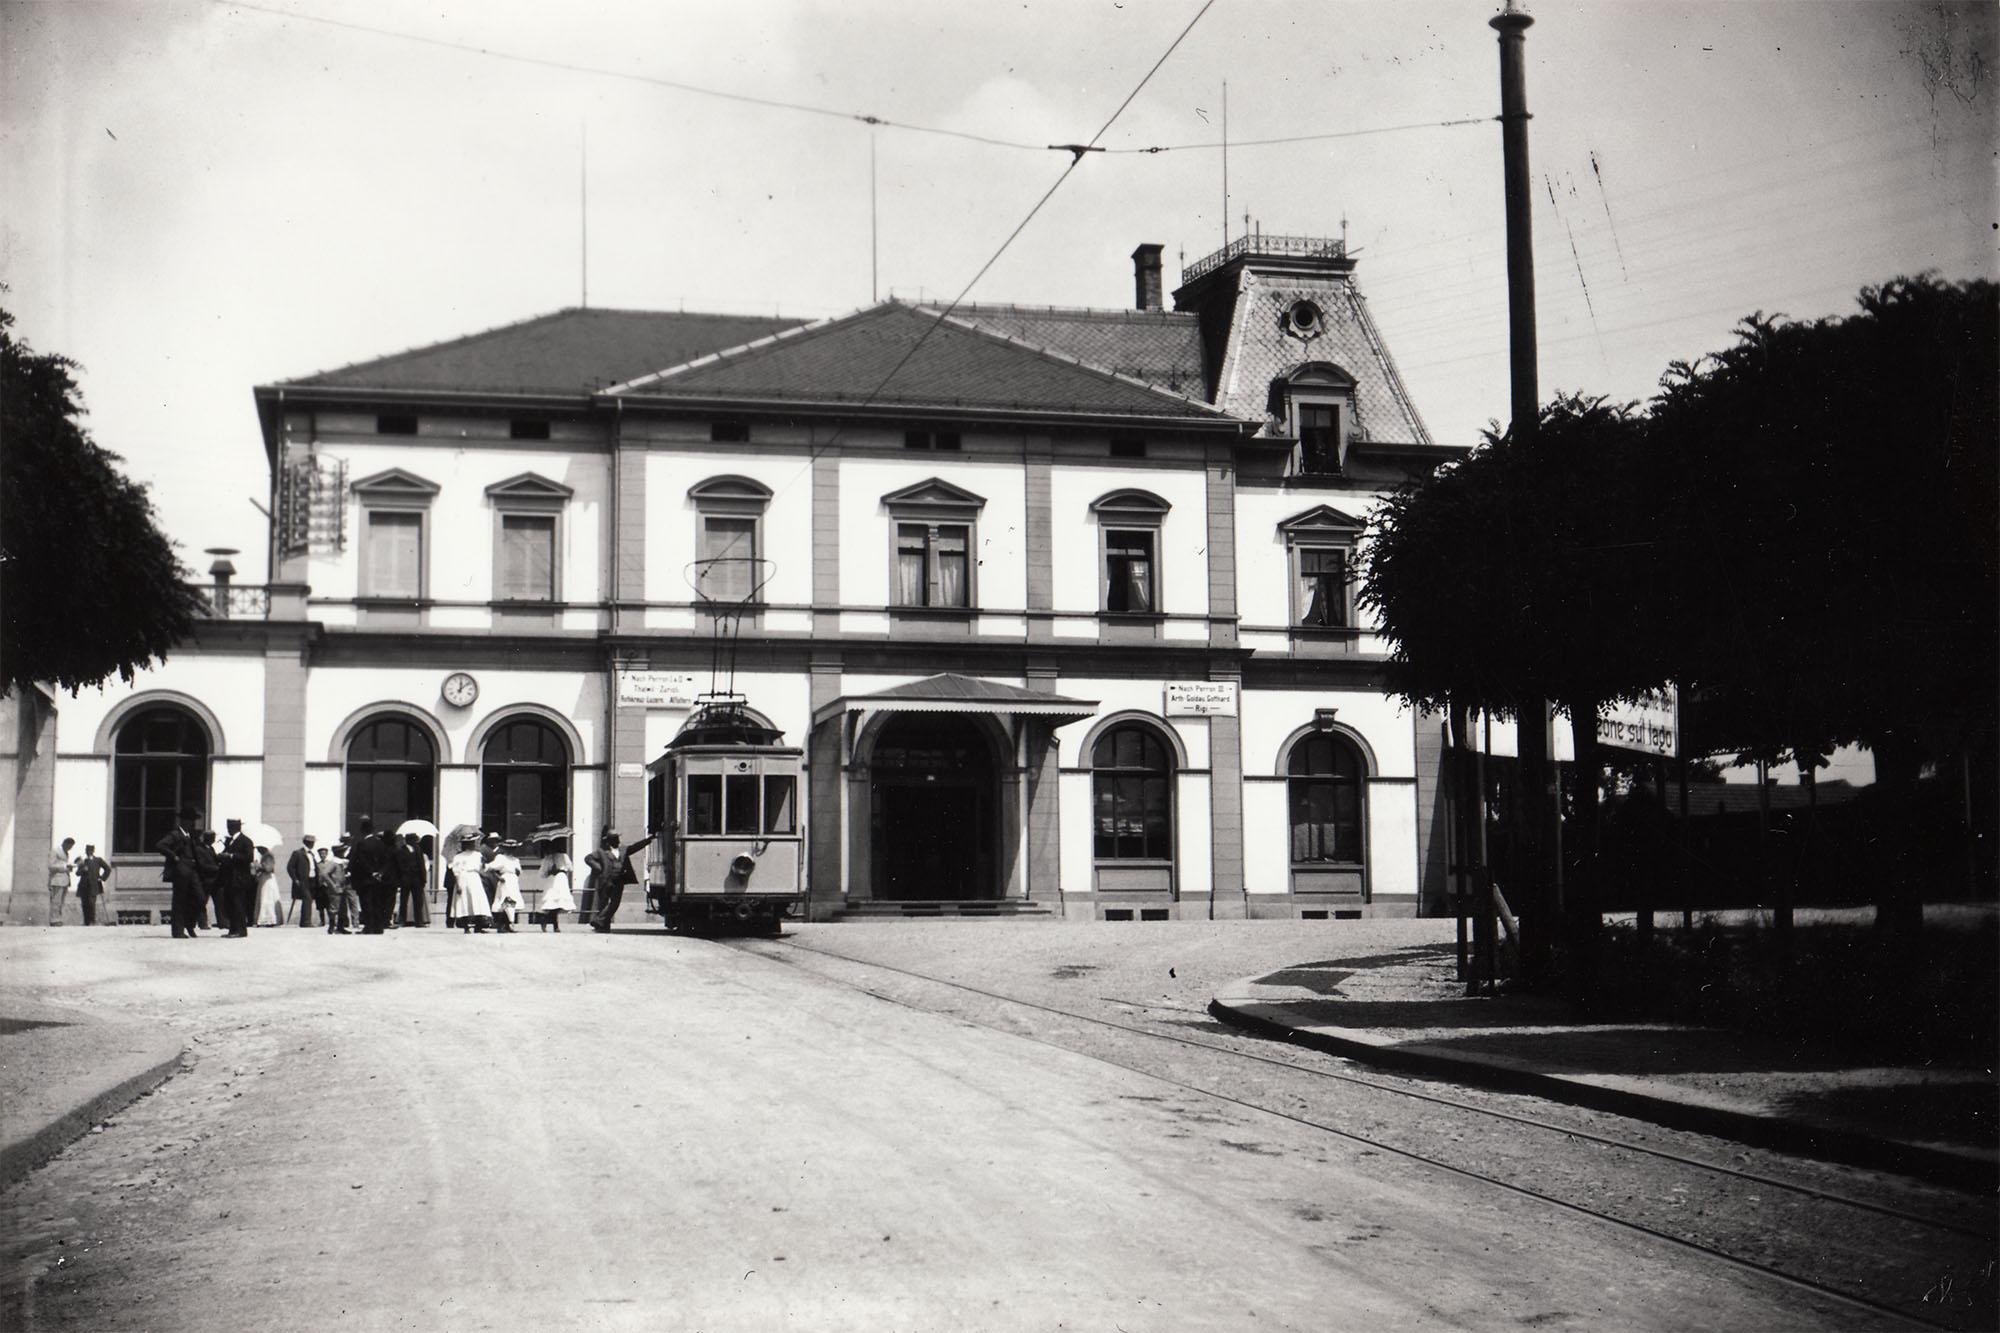 Haltestelle Bahnhof Zug